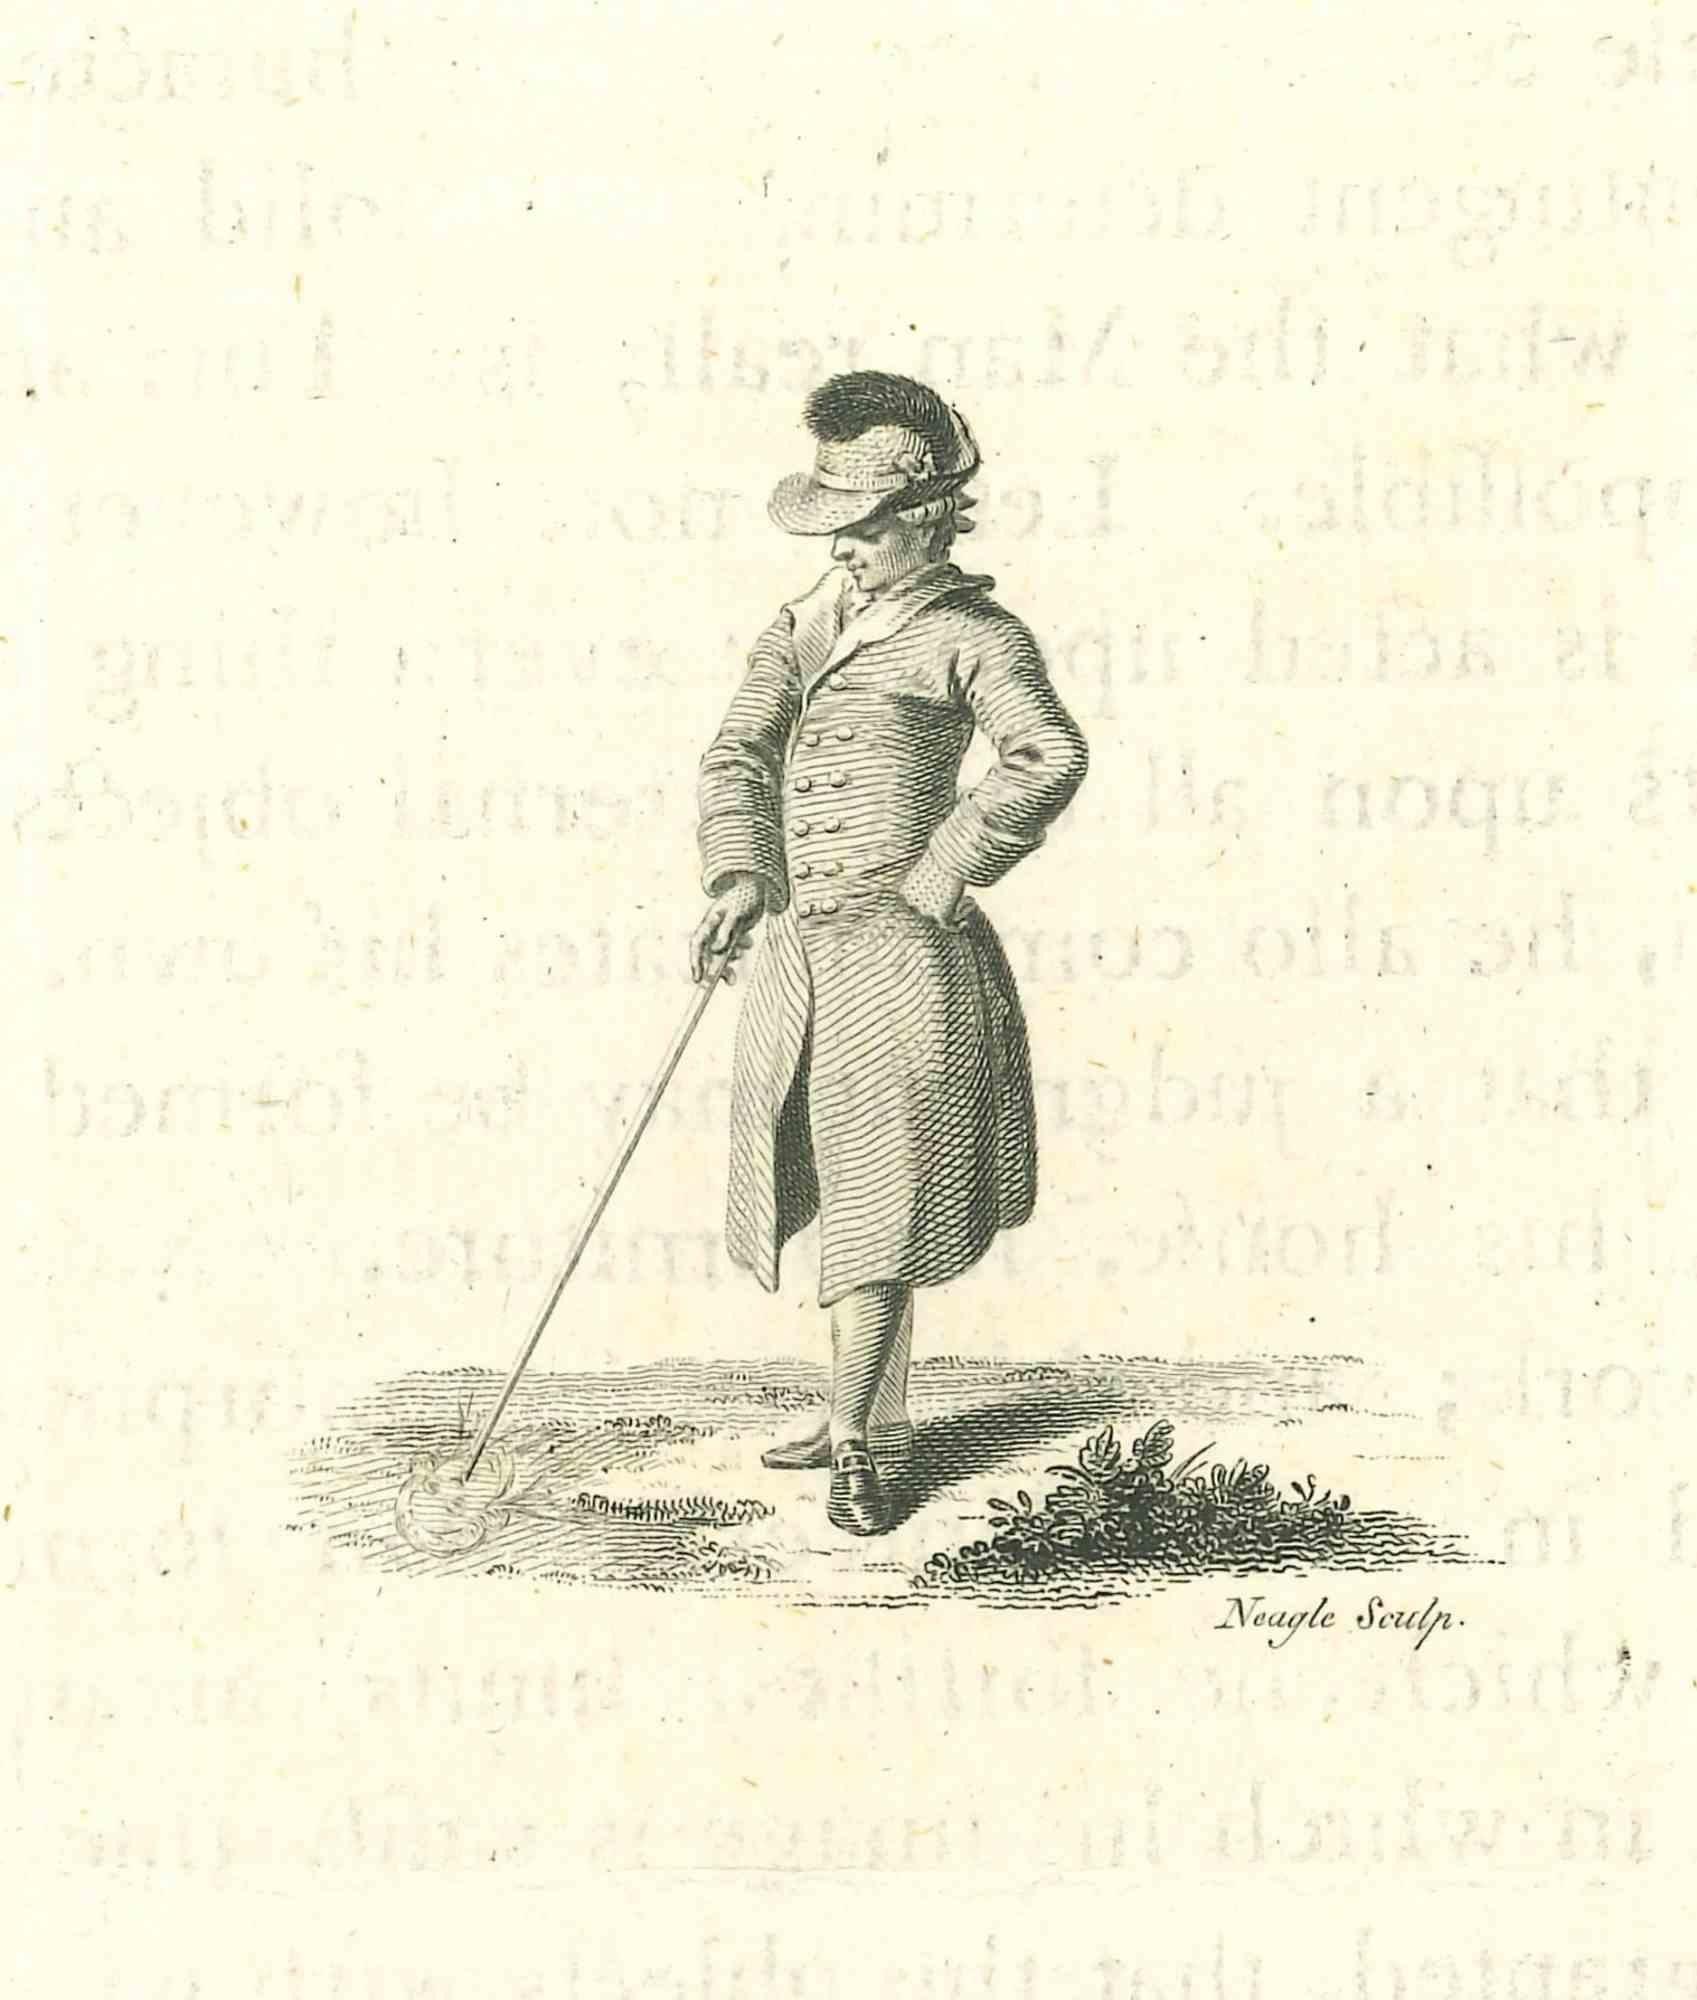 Portrait of Gentleman - Original Etching by James Neagle - 1810